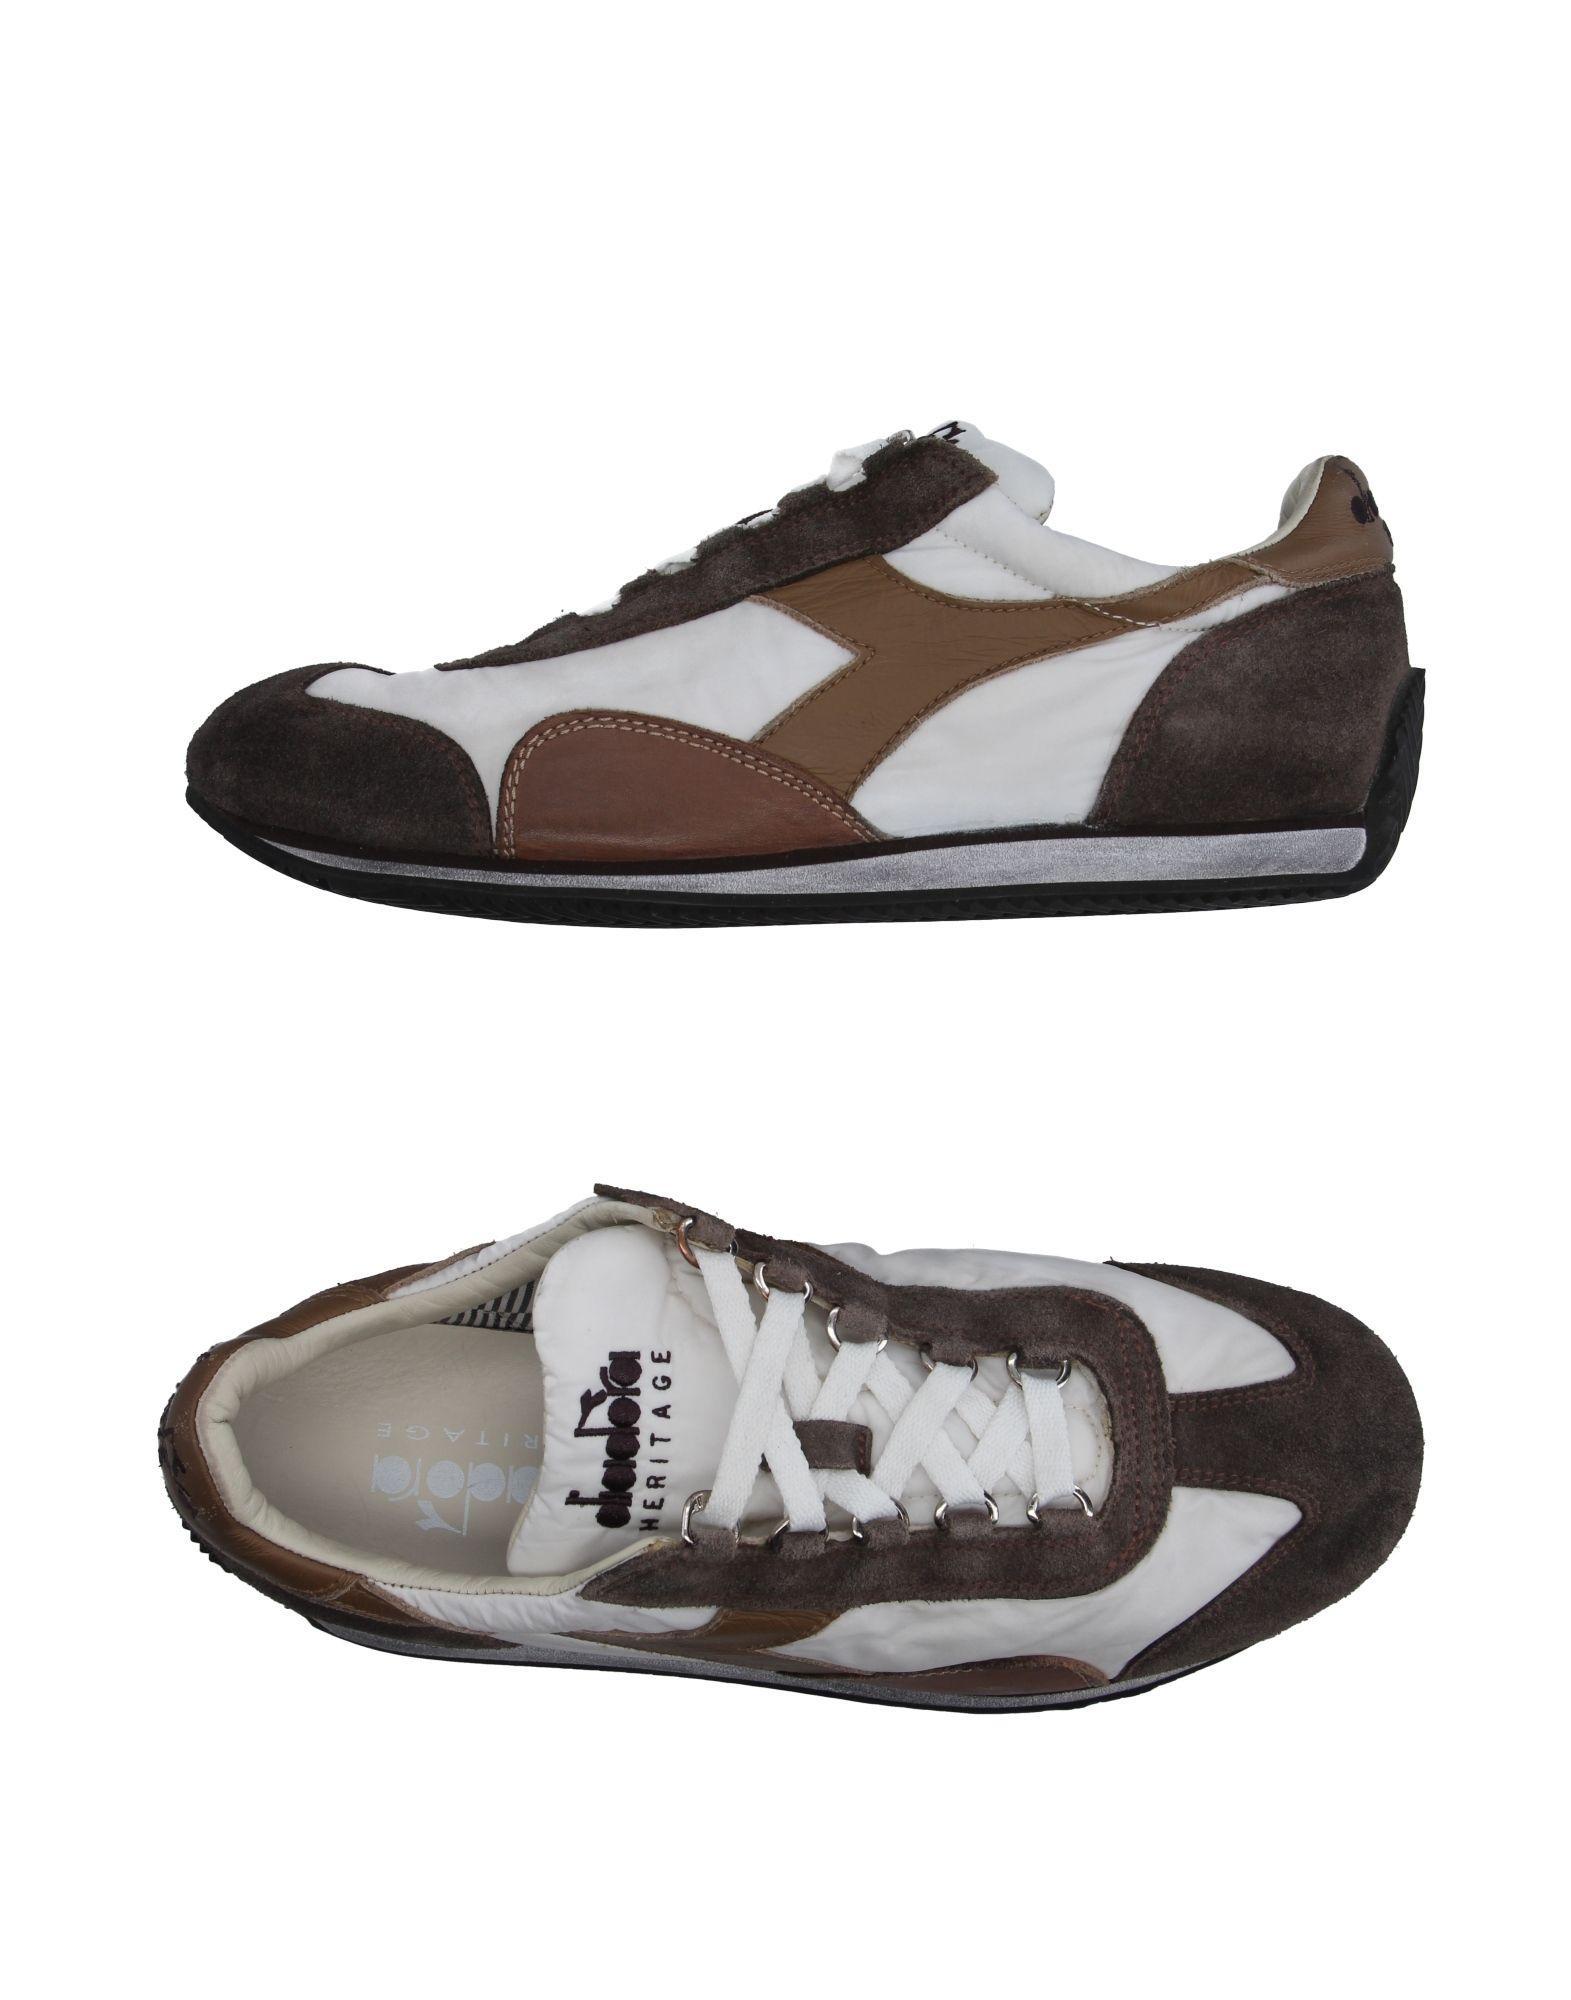 Lodi Shoes Uk